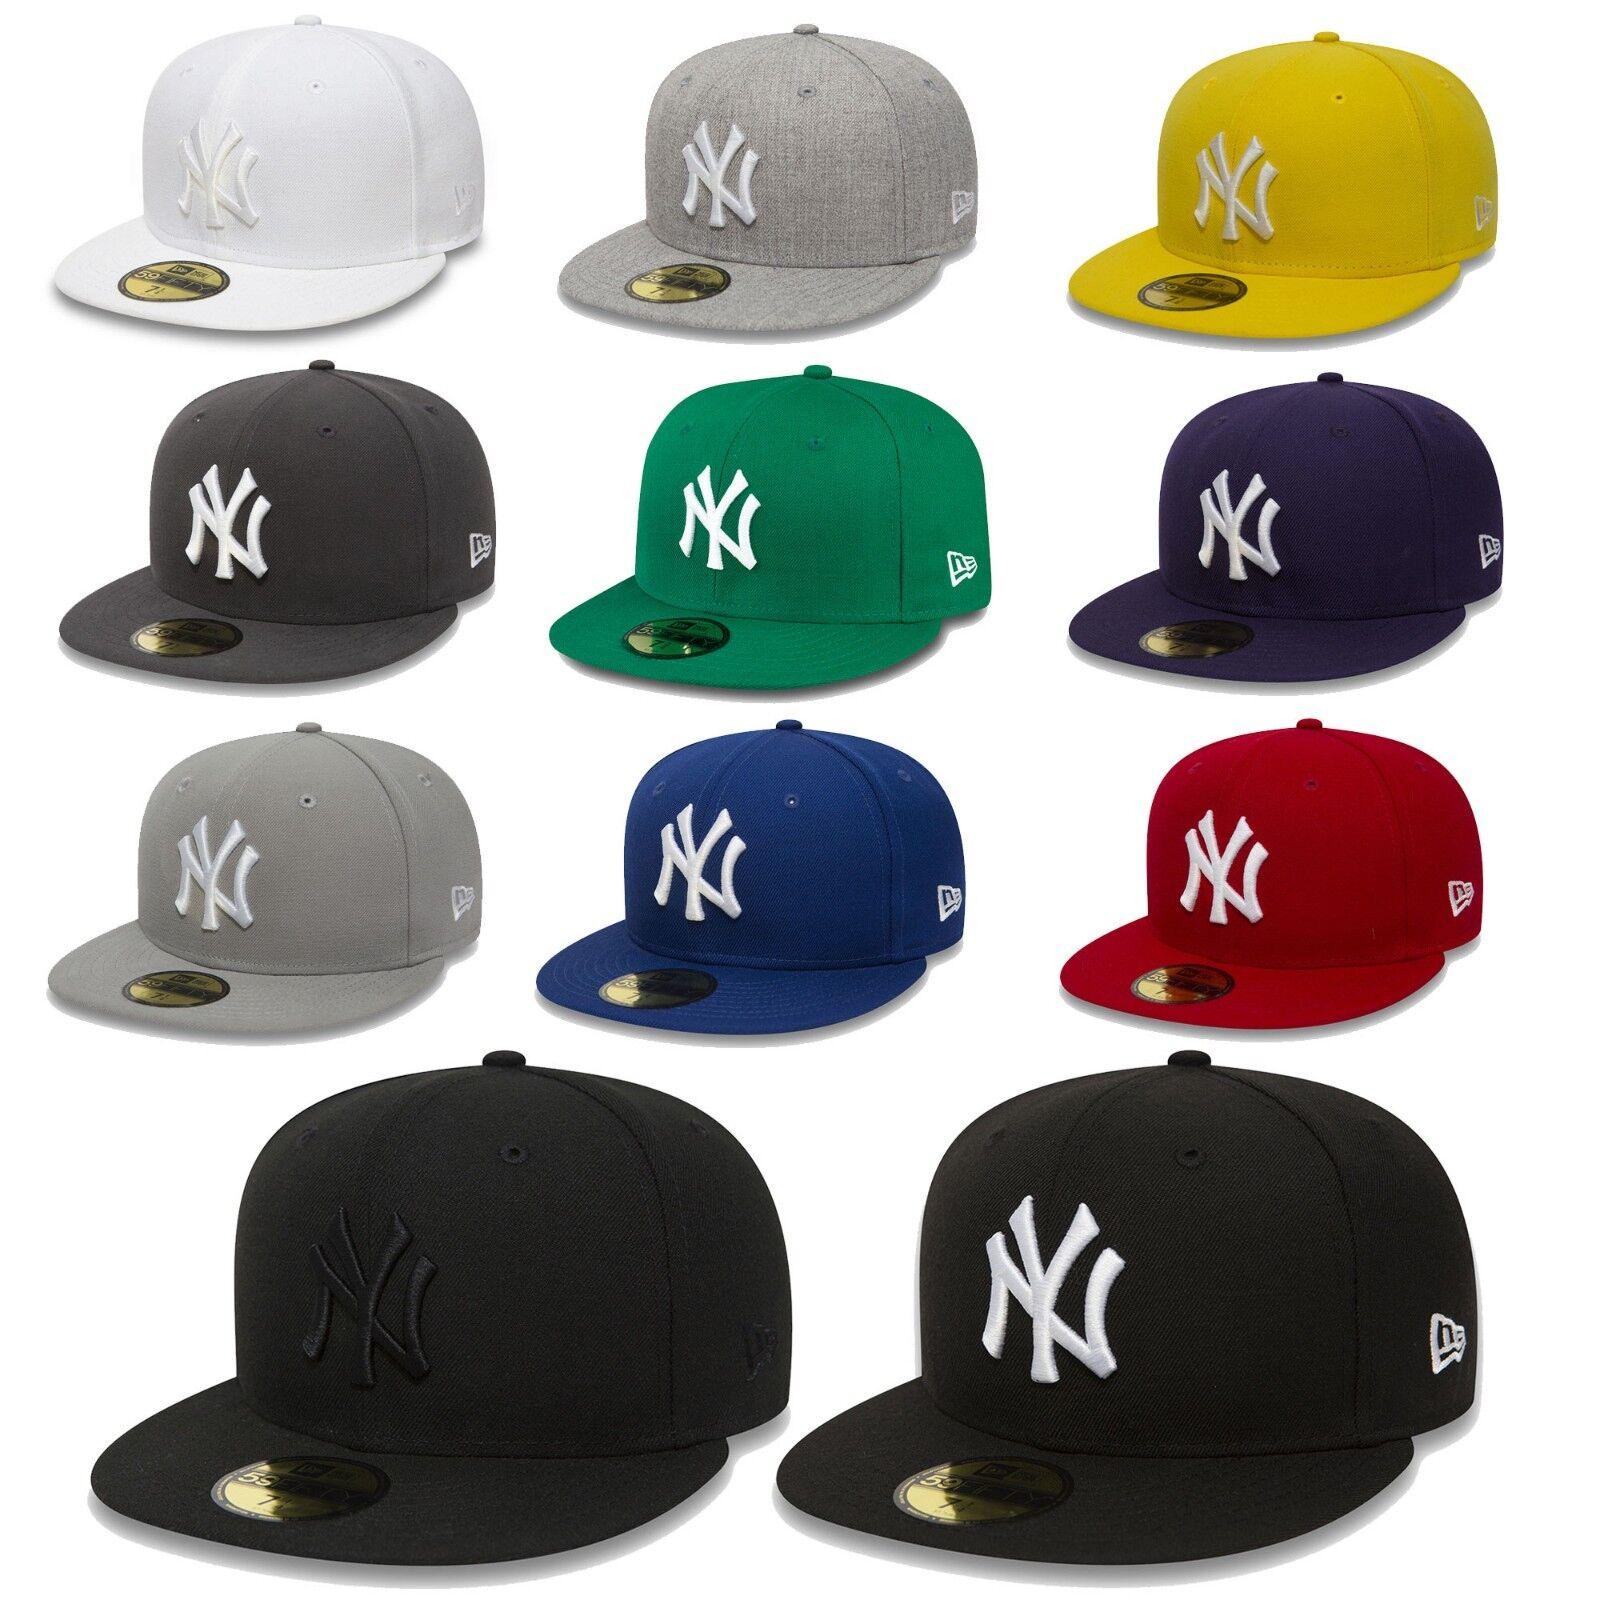 New Era Cap 59Fifty Fitted New York Yankees MLB Baseball Cap Basecap Authentic